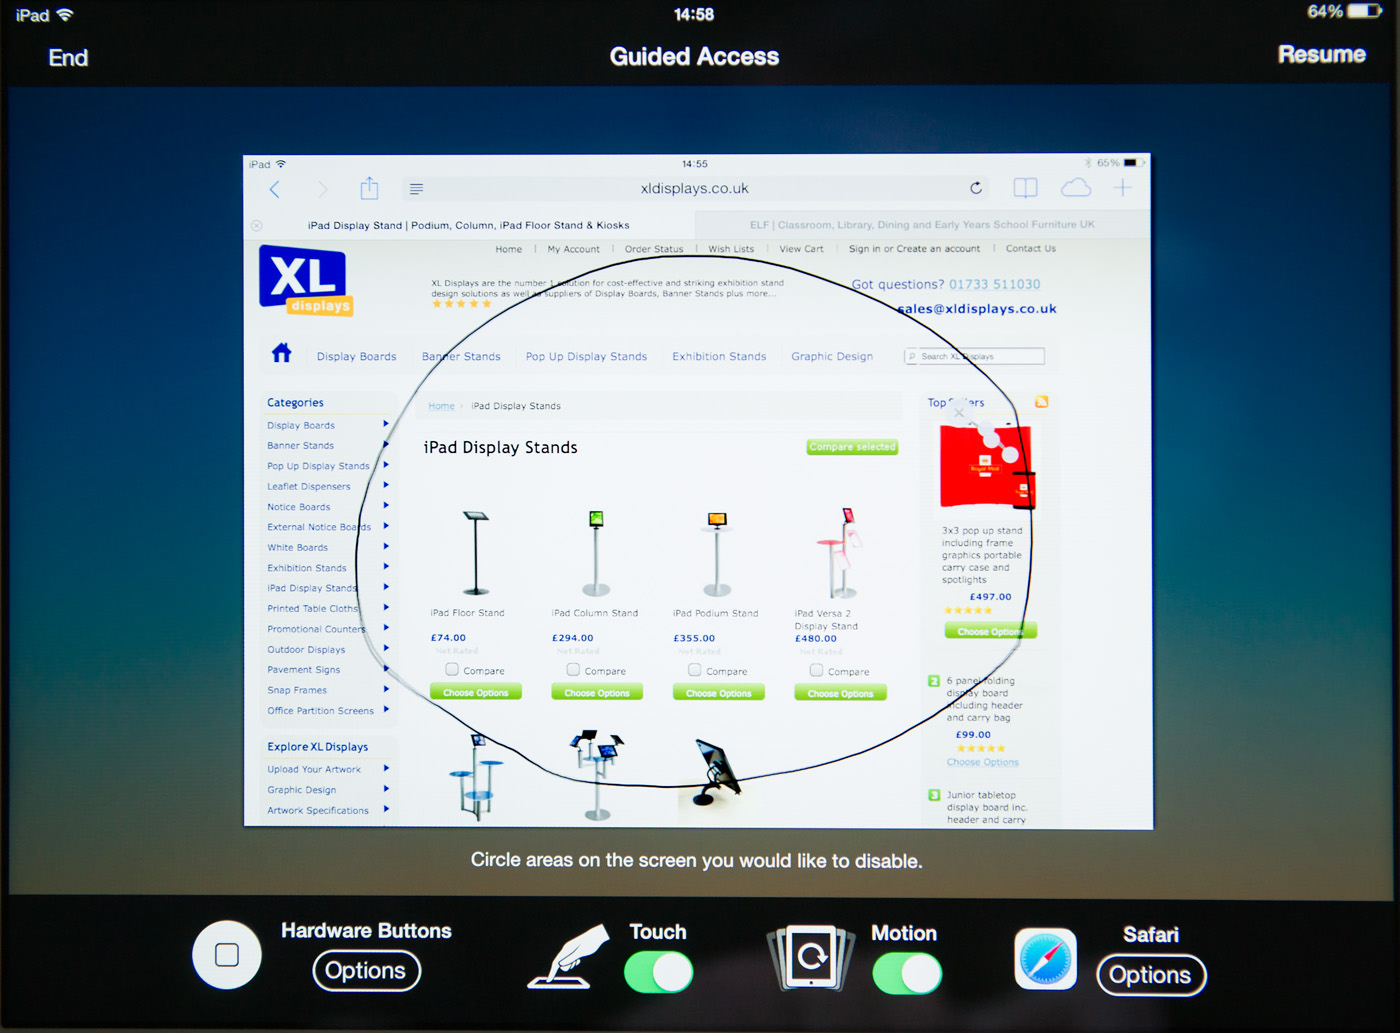 lock-ipad-screen-ios7-guided-access-home-retina-screenshot-6.jpg